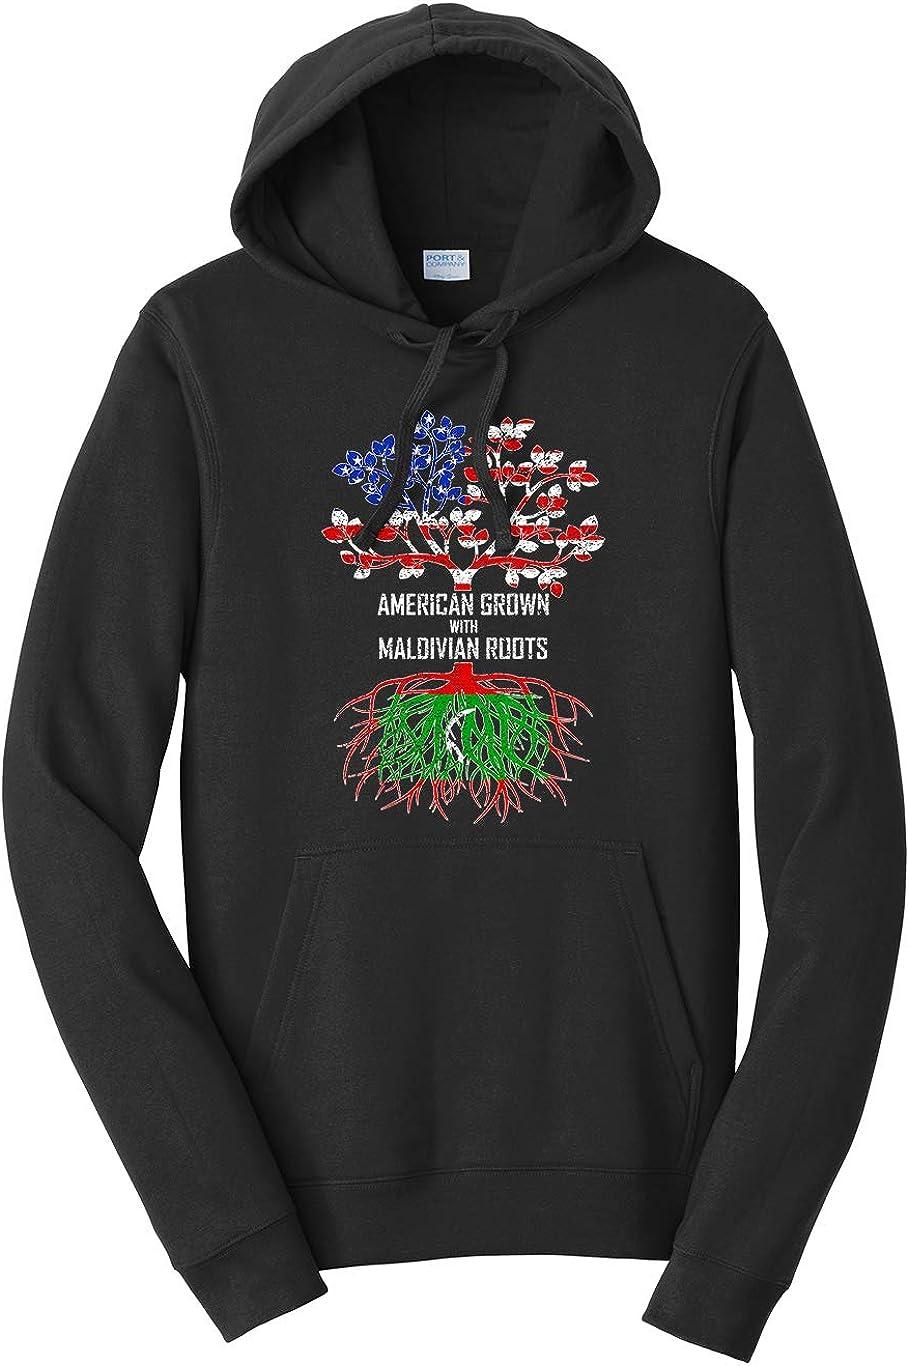 Tenacitee Unisex American Grown with Maldivian Roots Hooded Sweatshirt